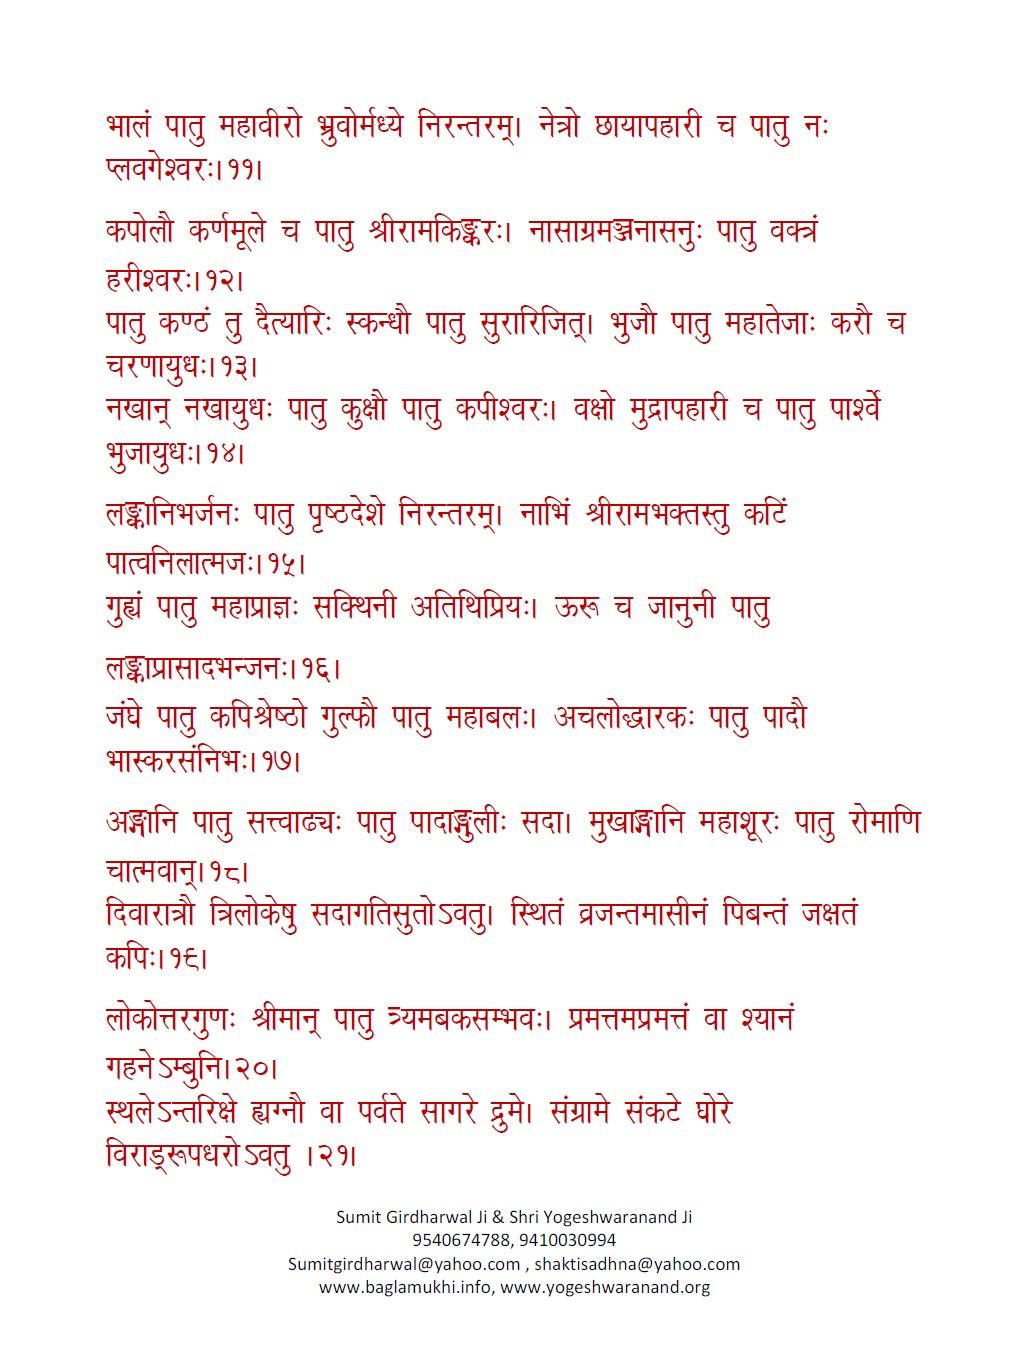 dakshina kali mantra pdf free